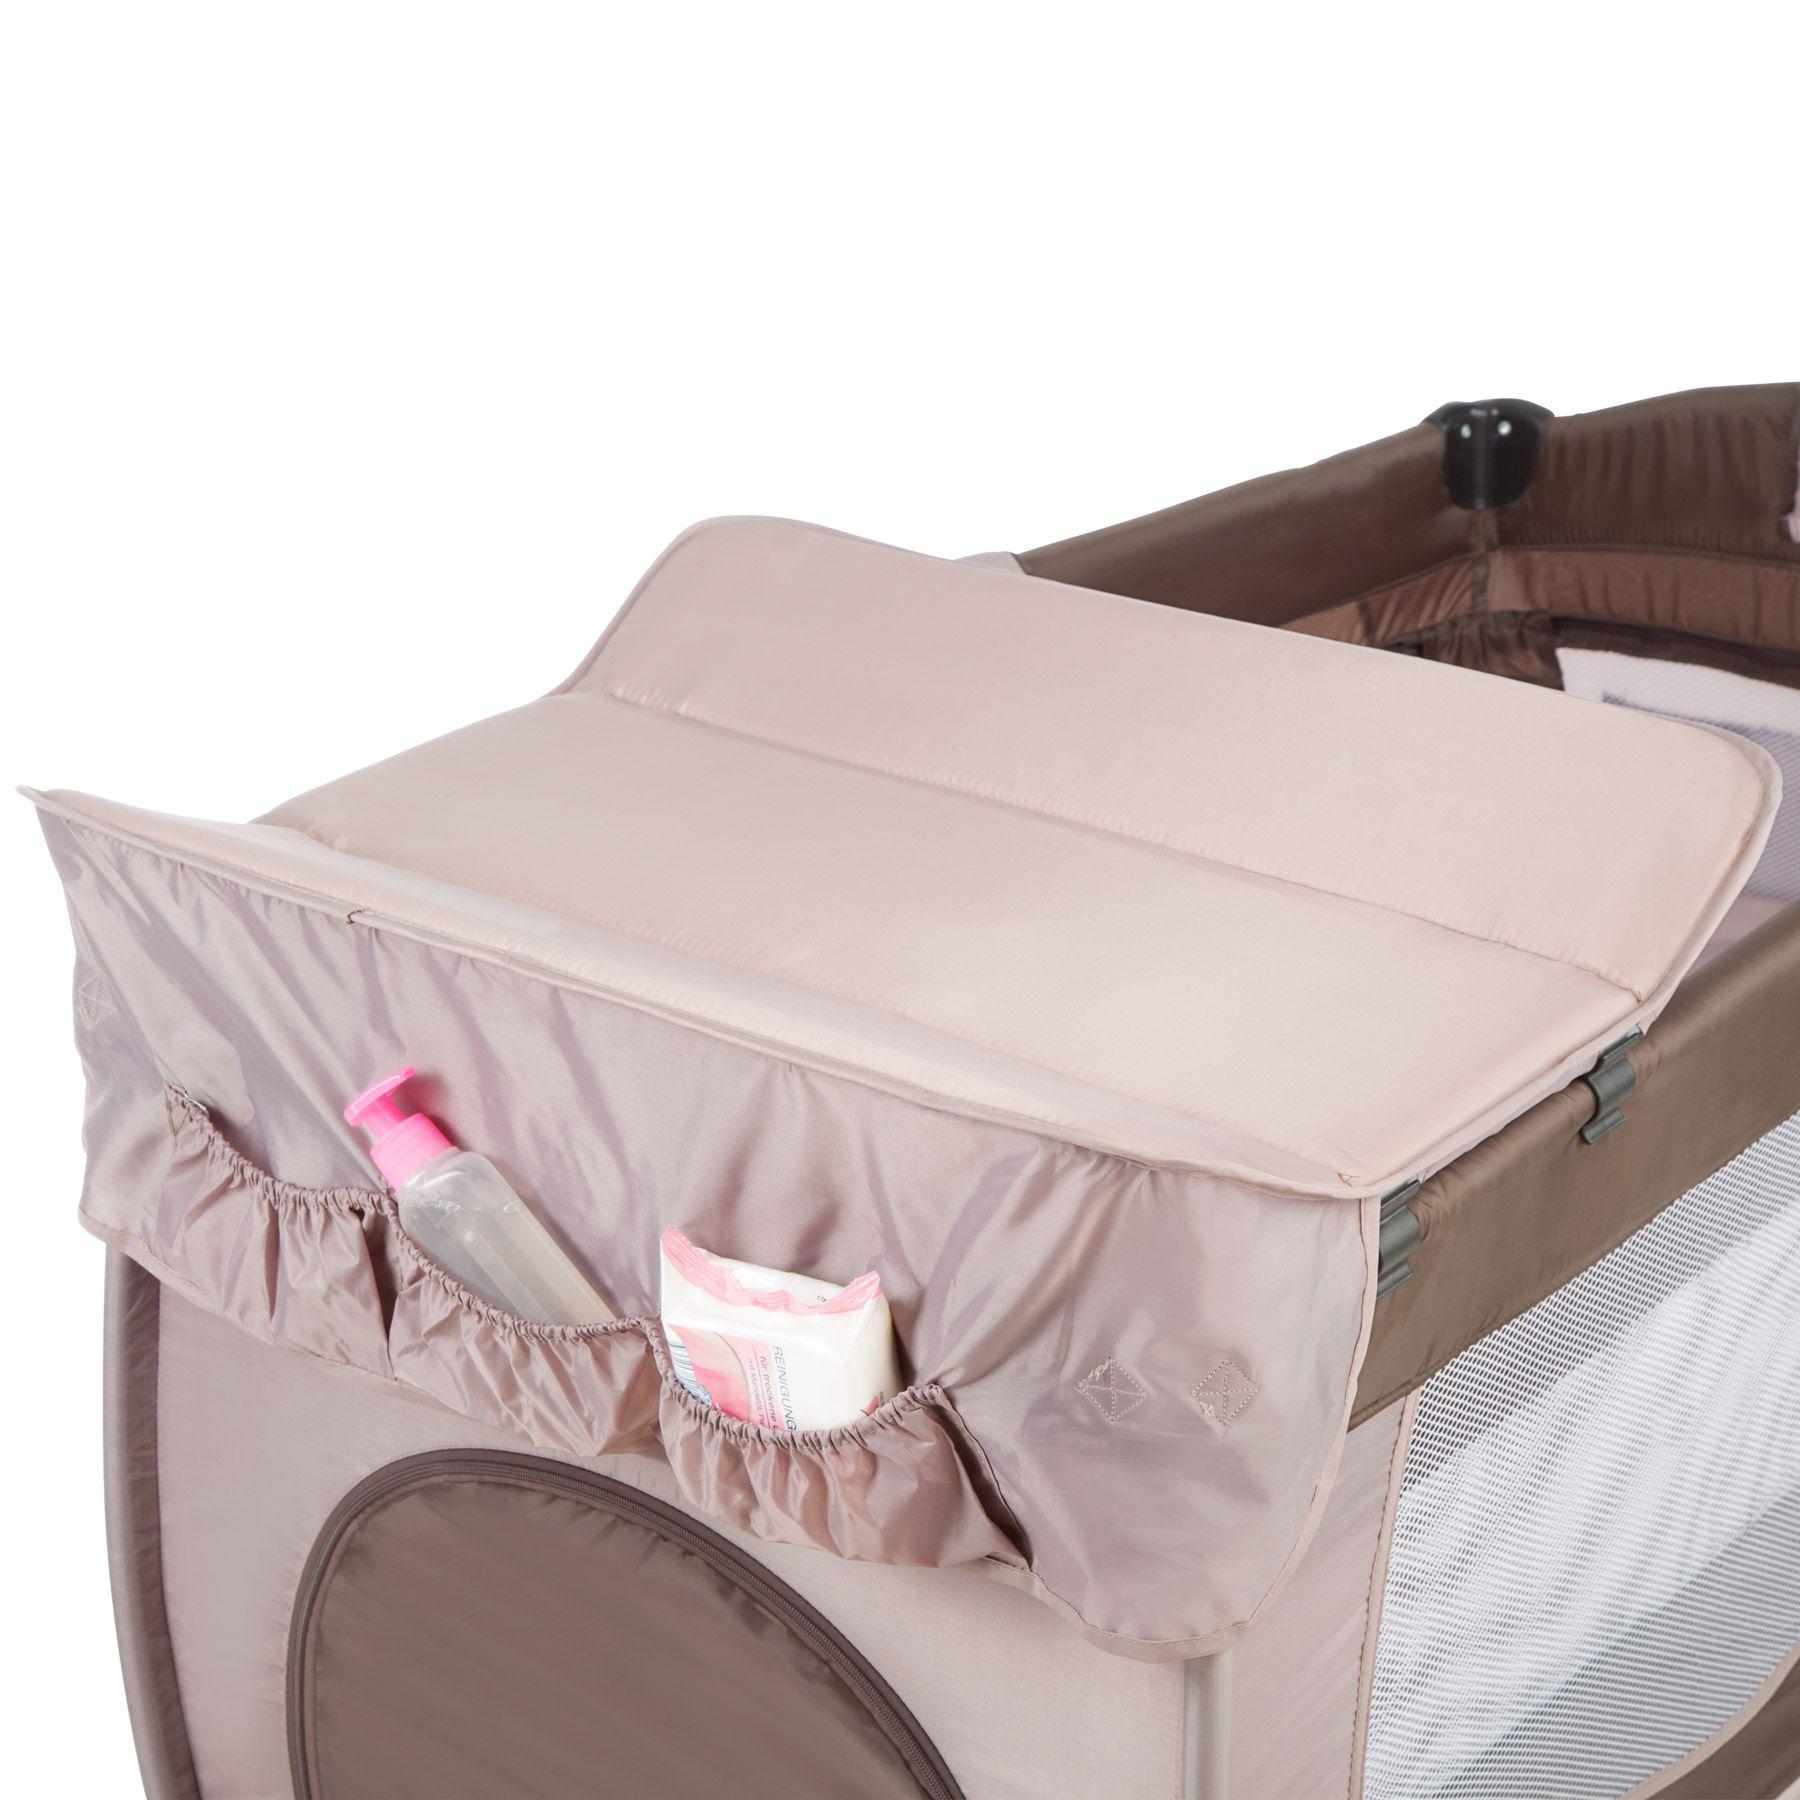 babybett kinder baby reisebett kinderreisebett kinderbett laufstall ebay. Black Bedroom Furniture Sets. Home Design Ideas